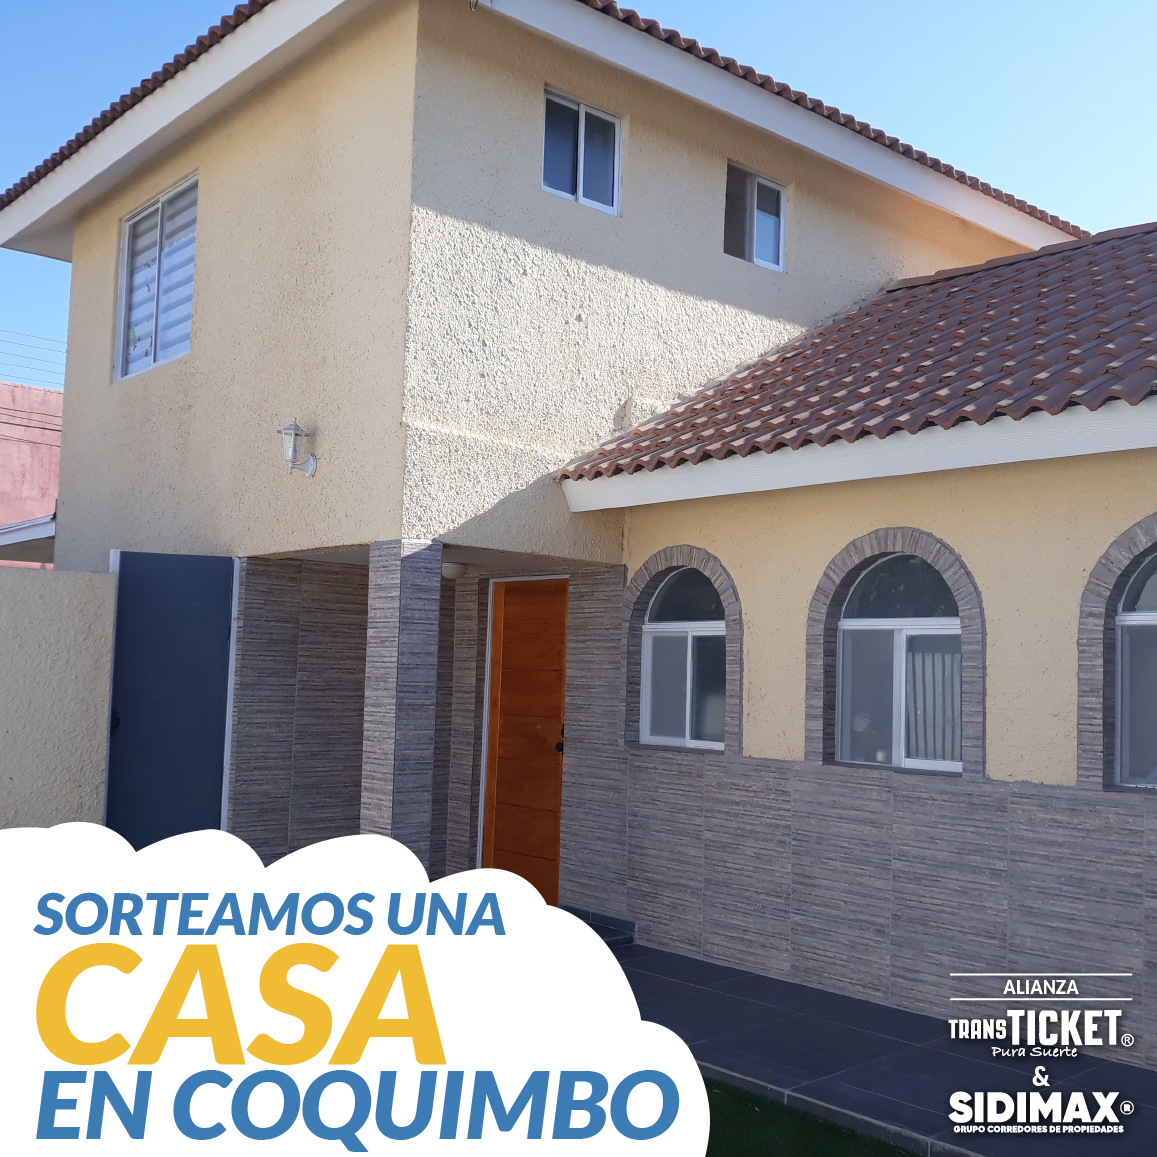 01-sorteo_casa_coquimbo